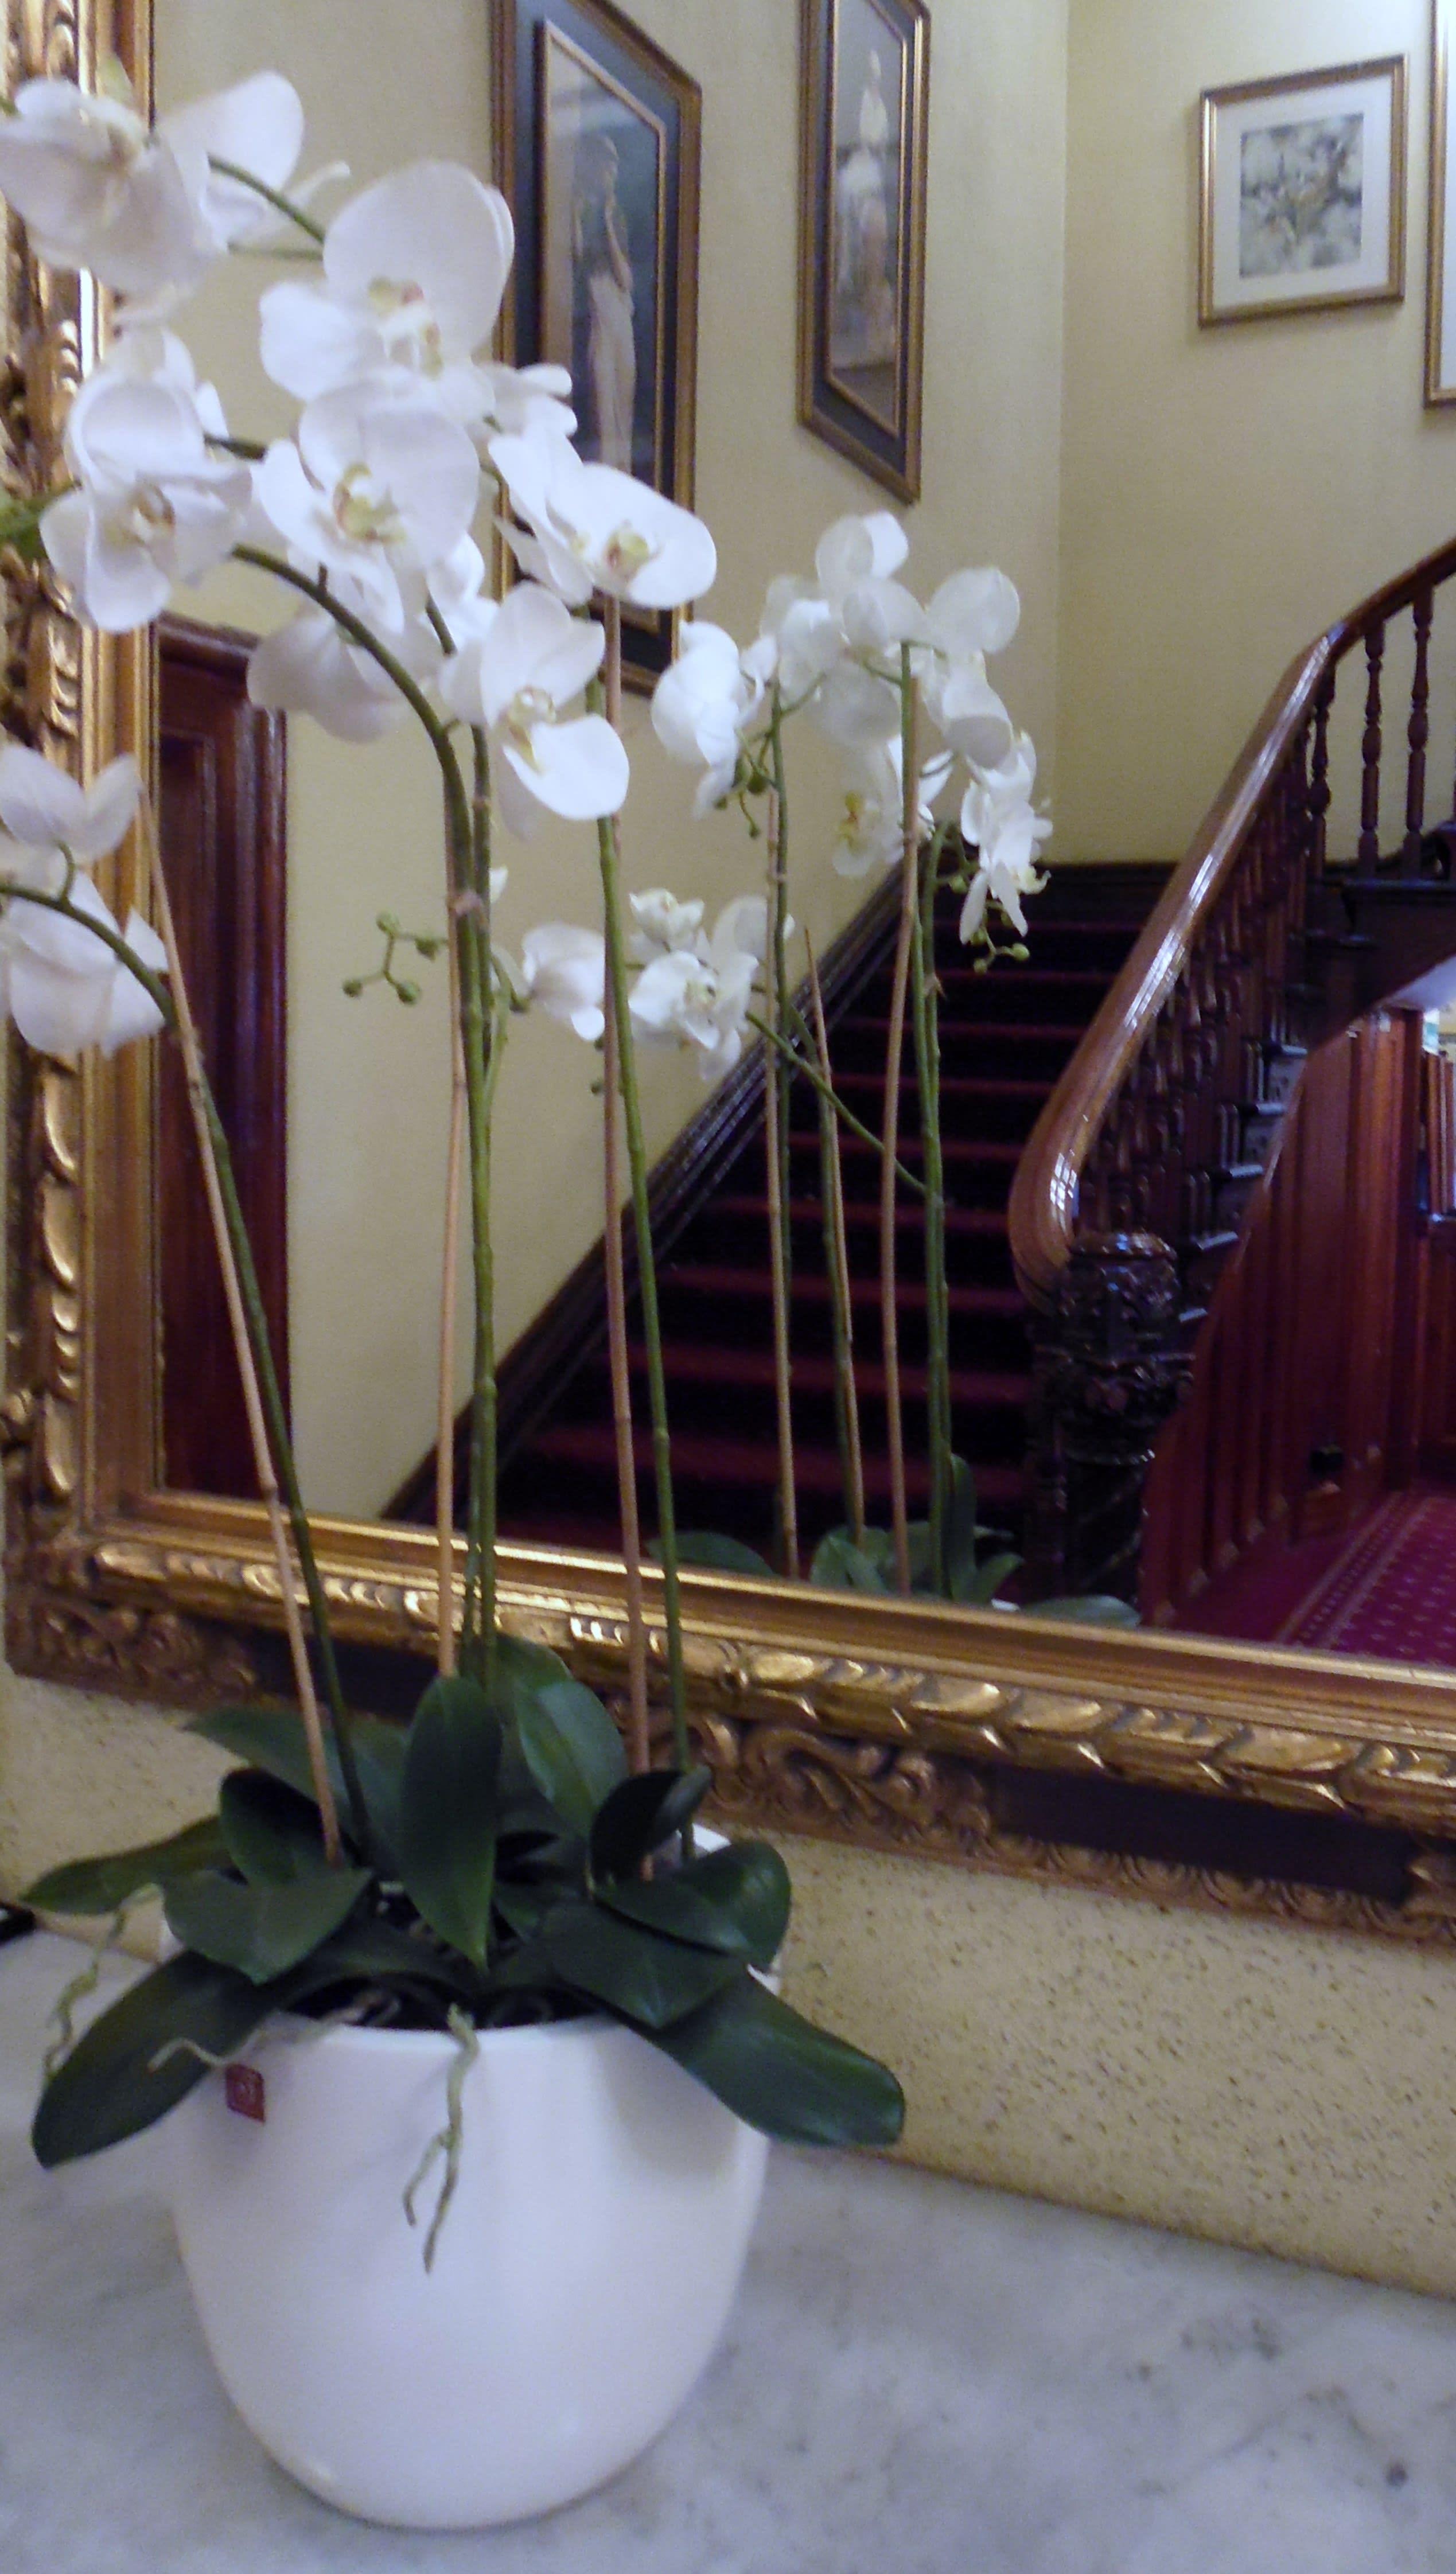 HOSTEL - Claremont Guesthouse